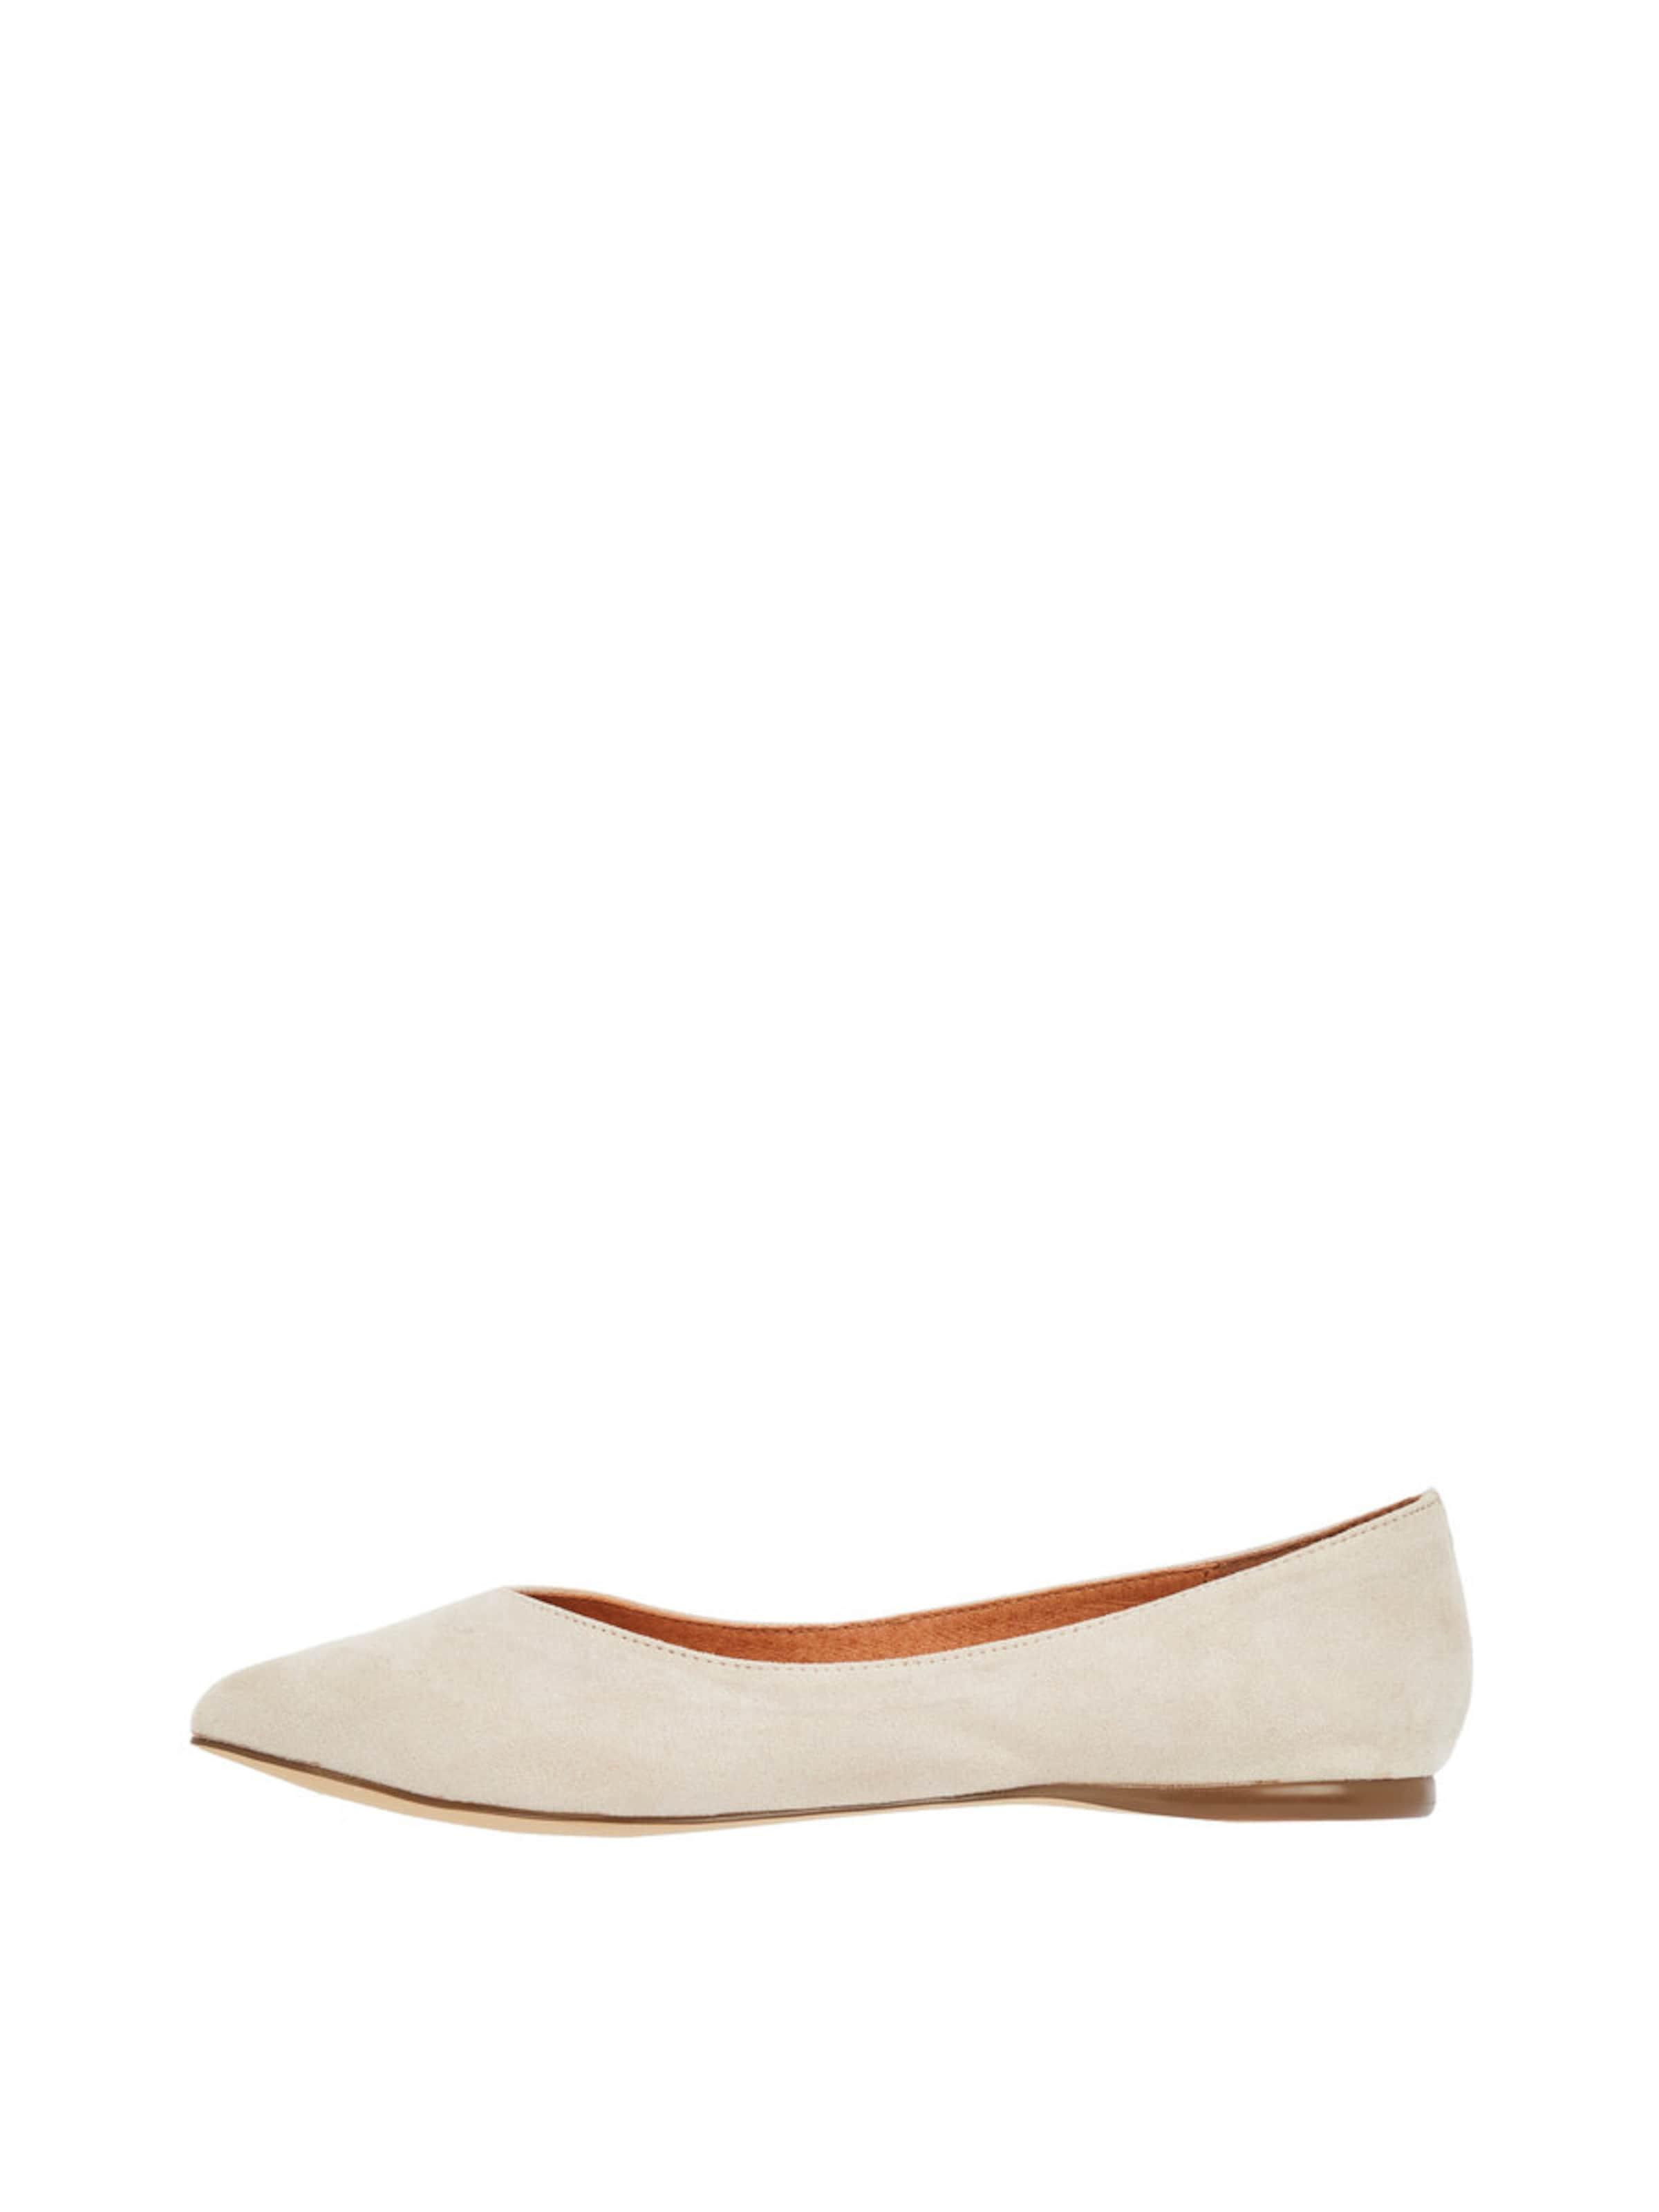 Haltbare Mode billige Schuhe Bianco   V-Cut Ballerinas Schuhe Gut getragene Schuhe